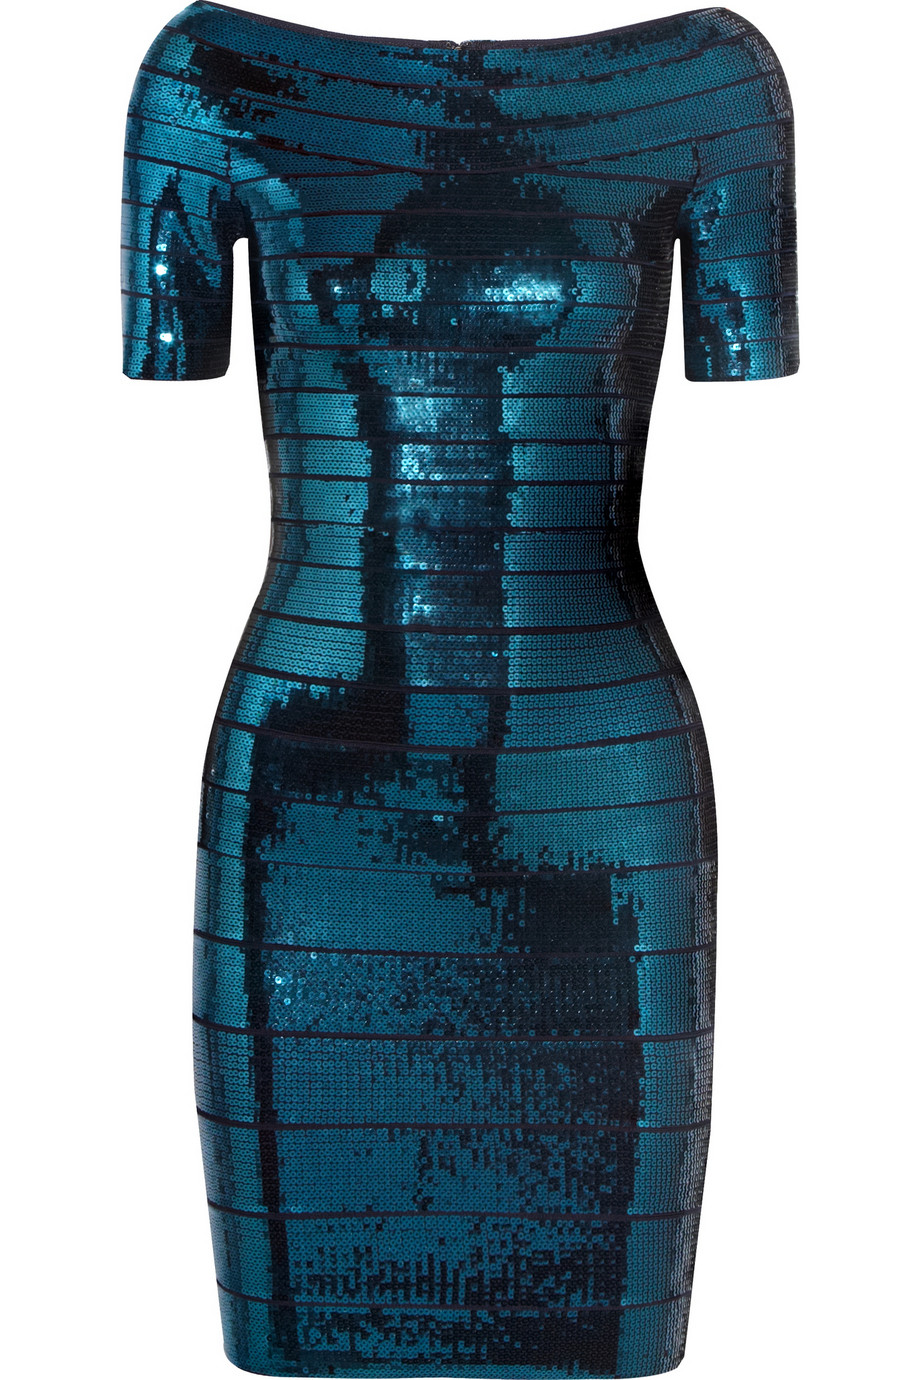 Hervé léger sequined bandage dress – 70% at the outnet.com